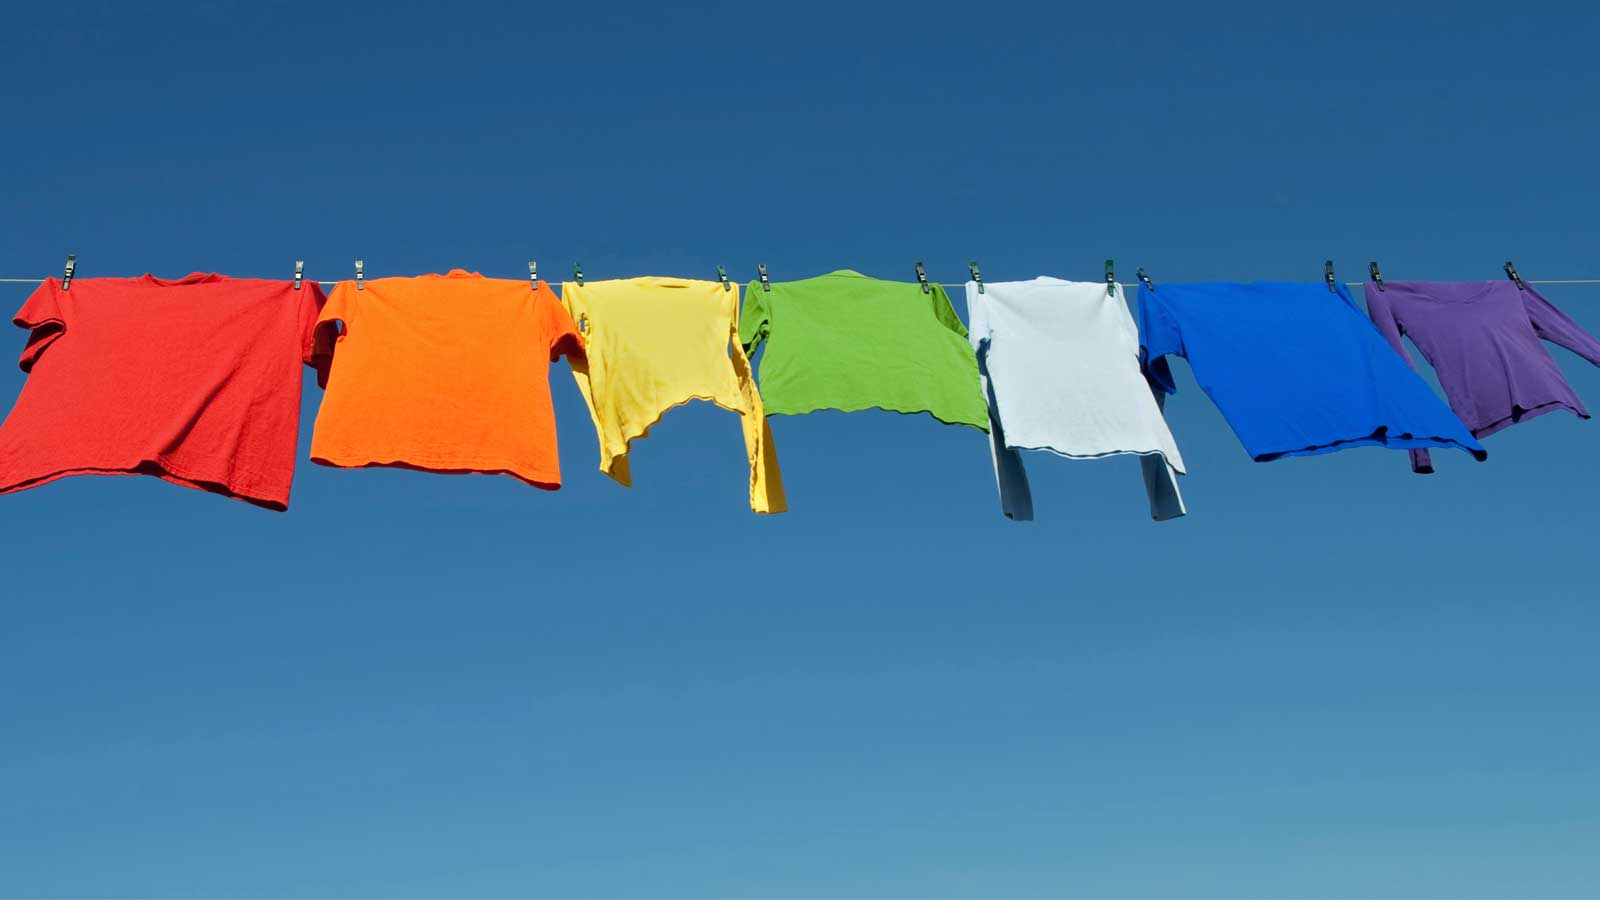 Roupa colorida a secar